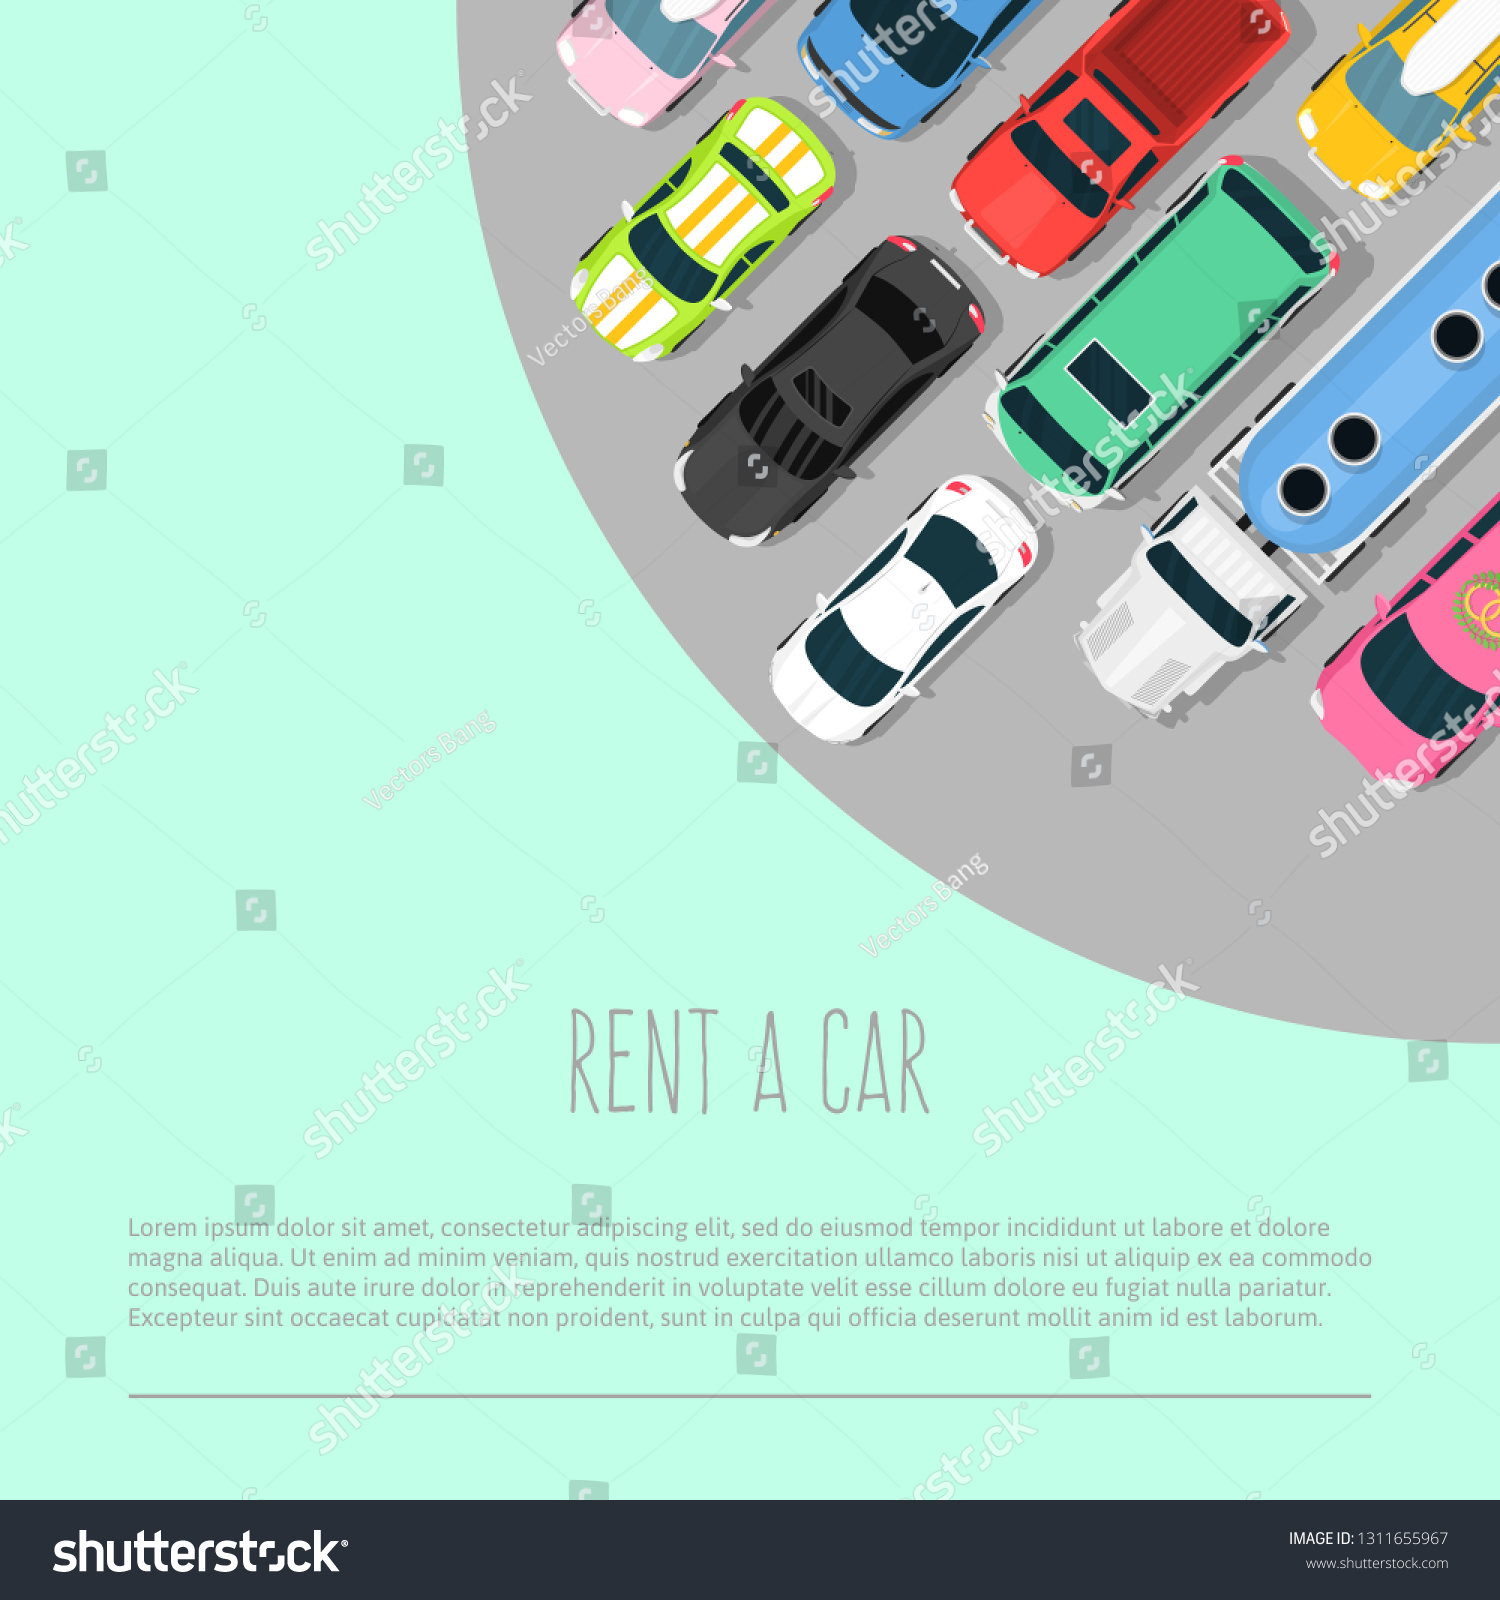 Car Rent Vector Illustration Choosing Best Stock Vector Royalty Free 1311655967